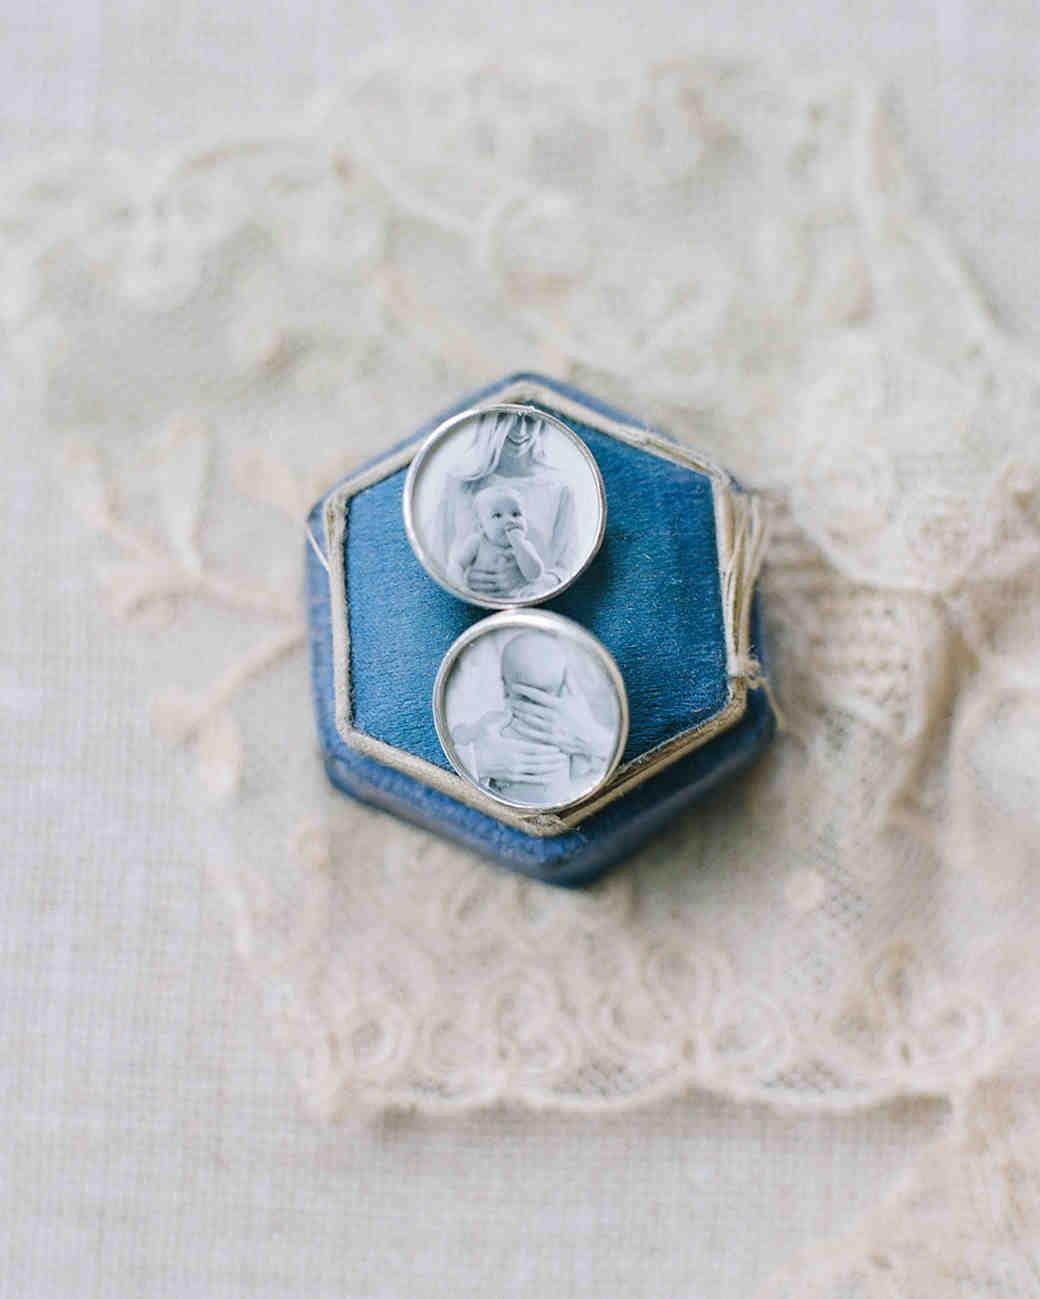 adrienne-jason-wedding-minnesota-photo-cuff-links-0049-s111925.jpg